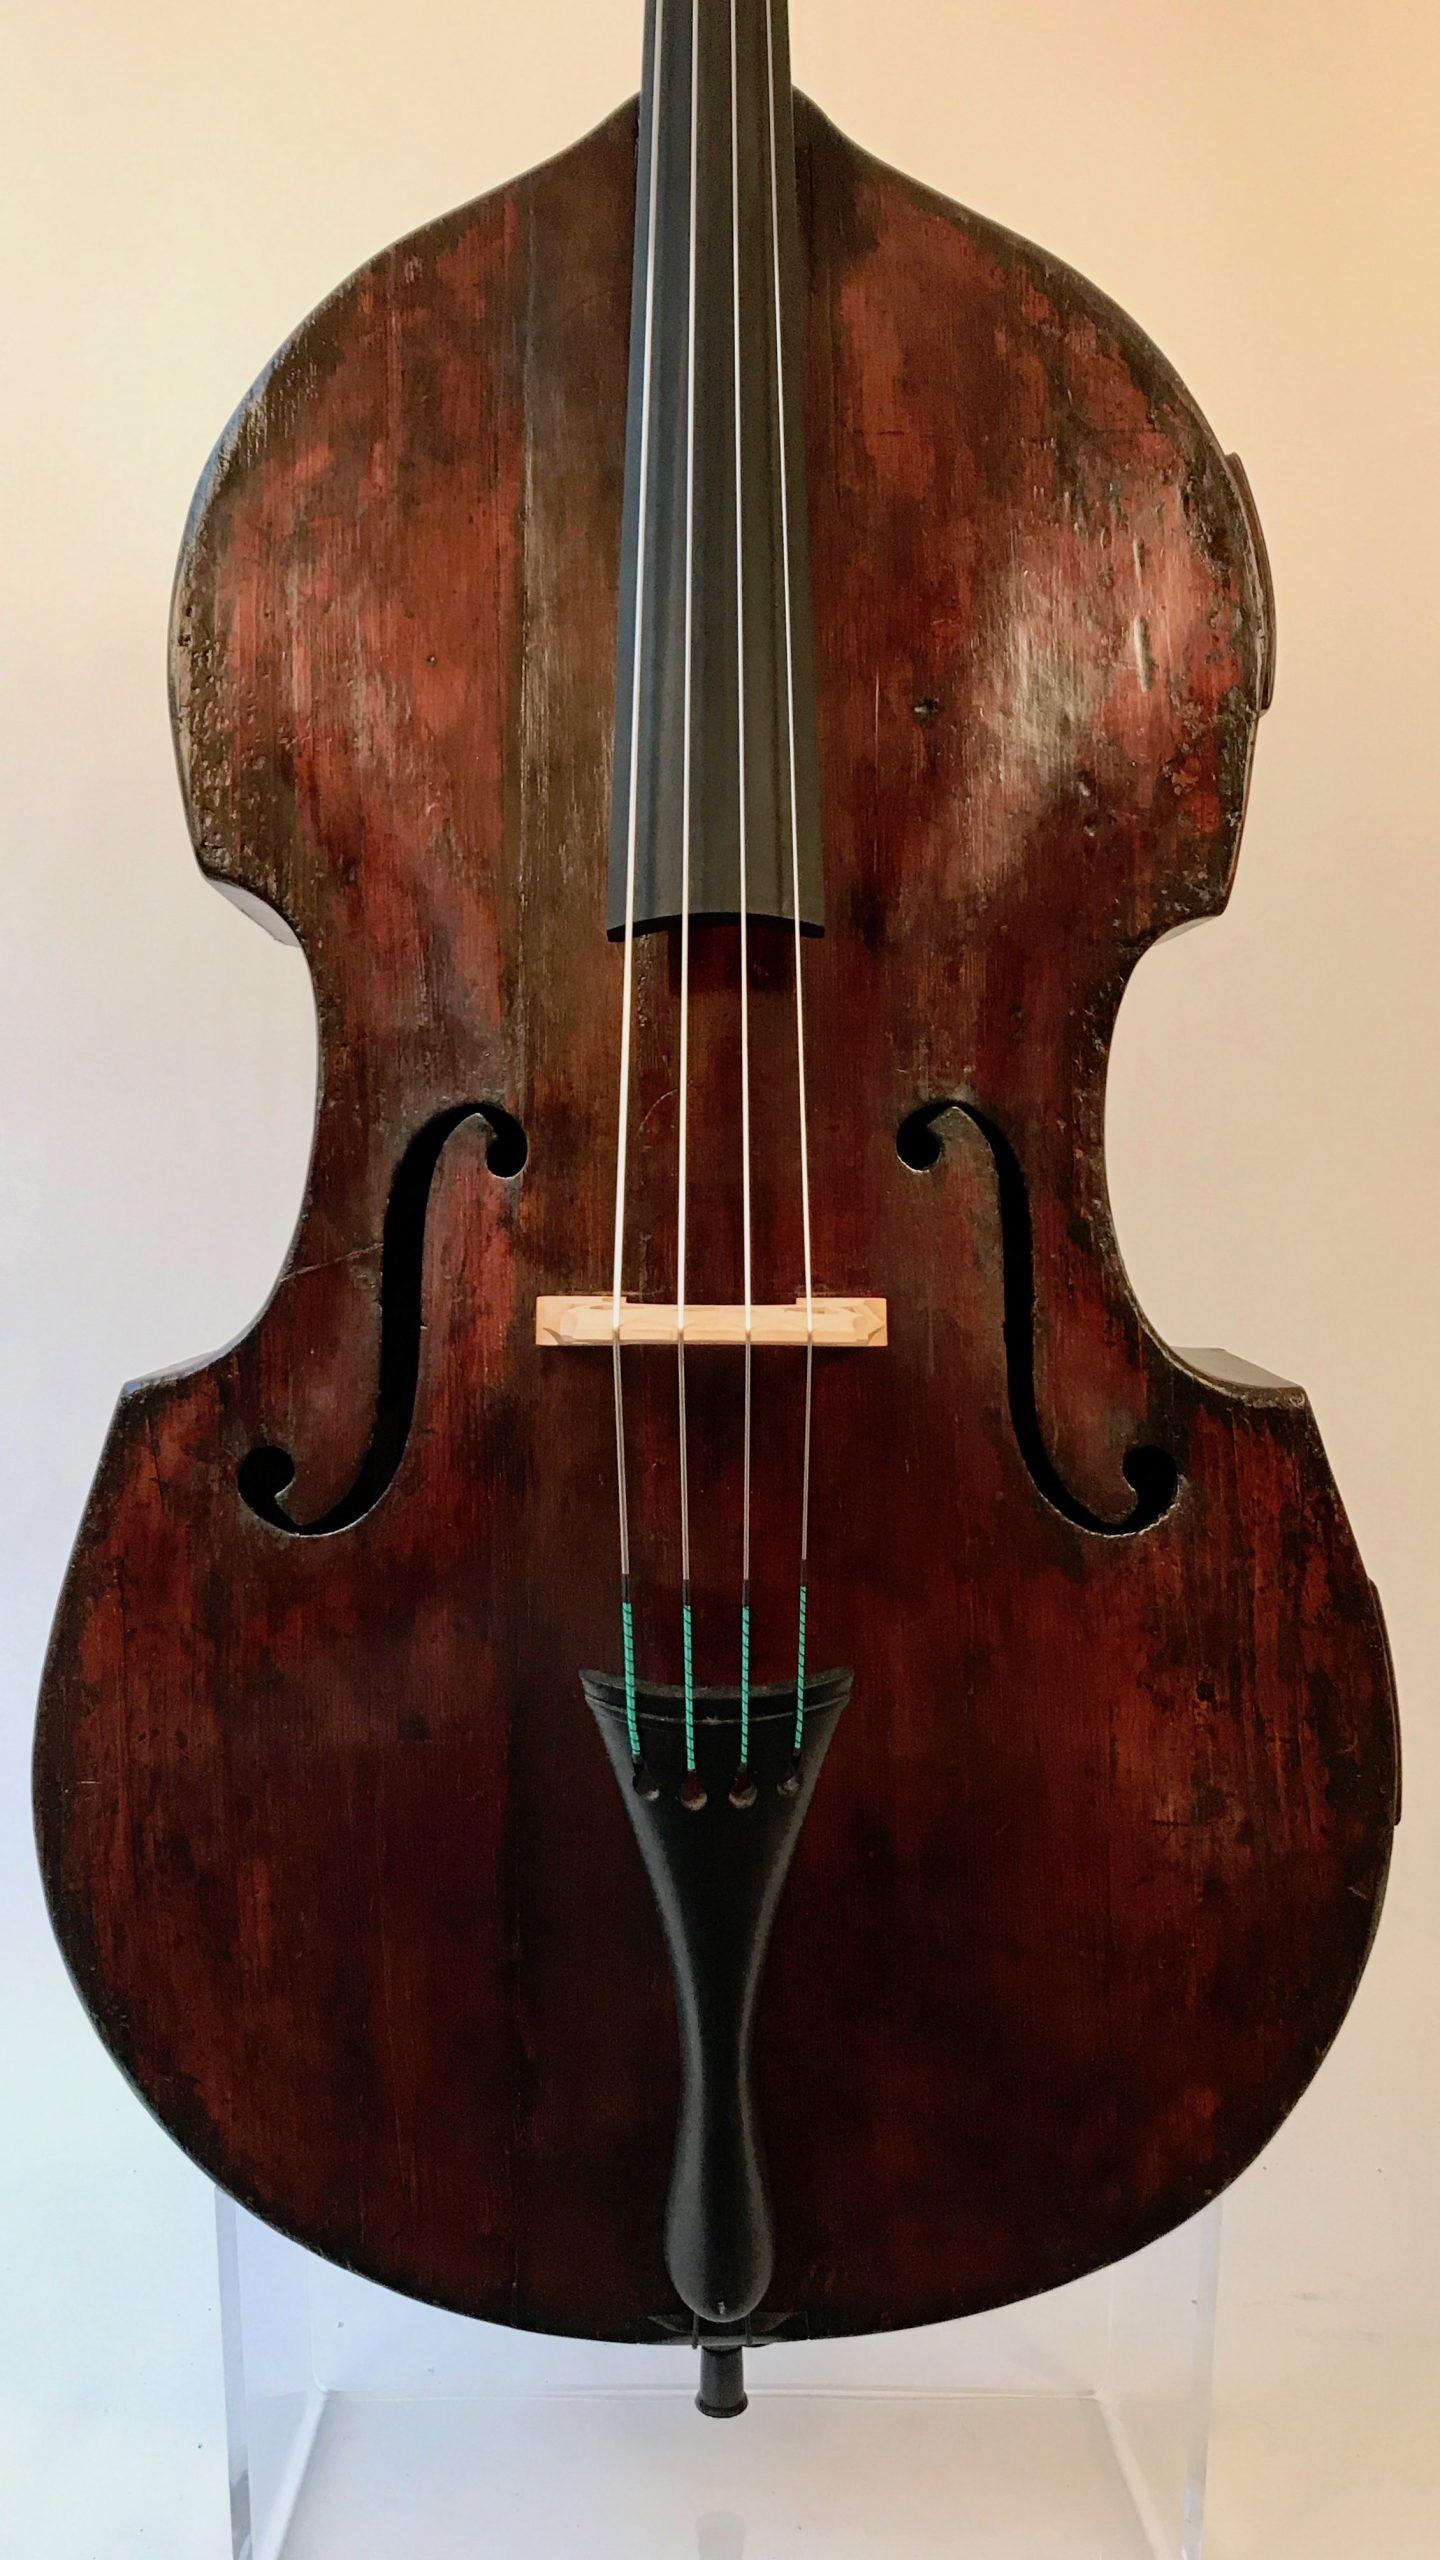 Nr. 170 Böhmisch, um 1840